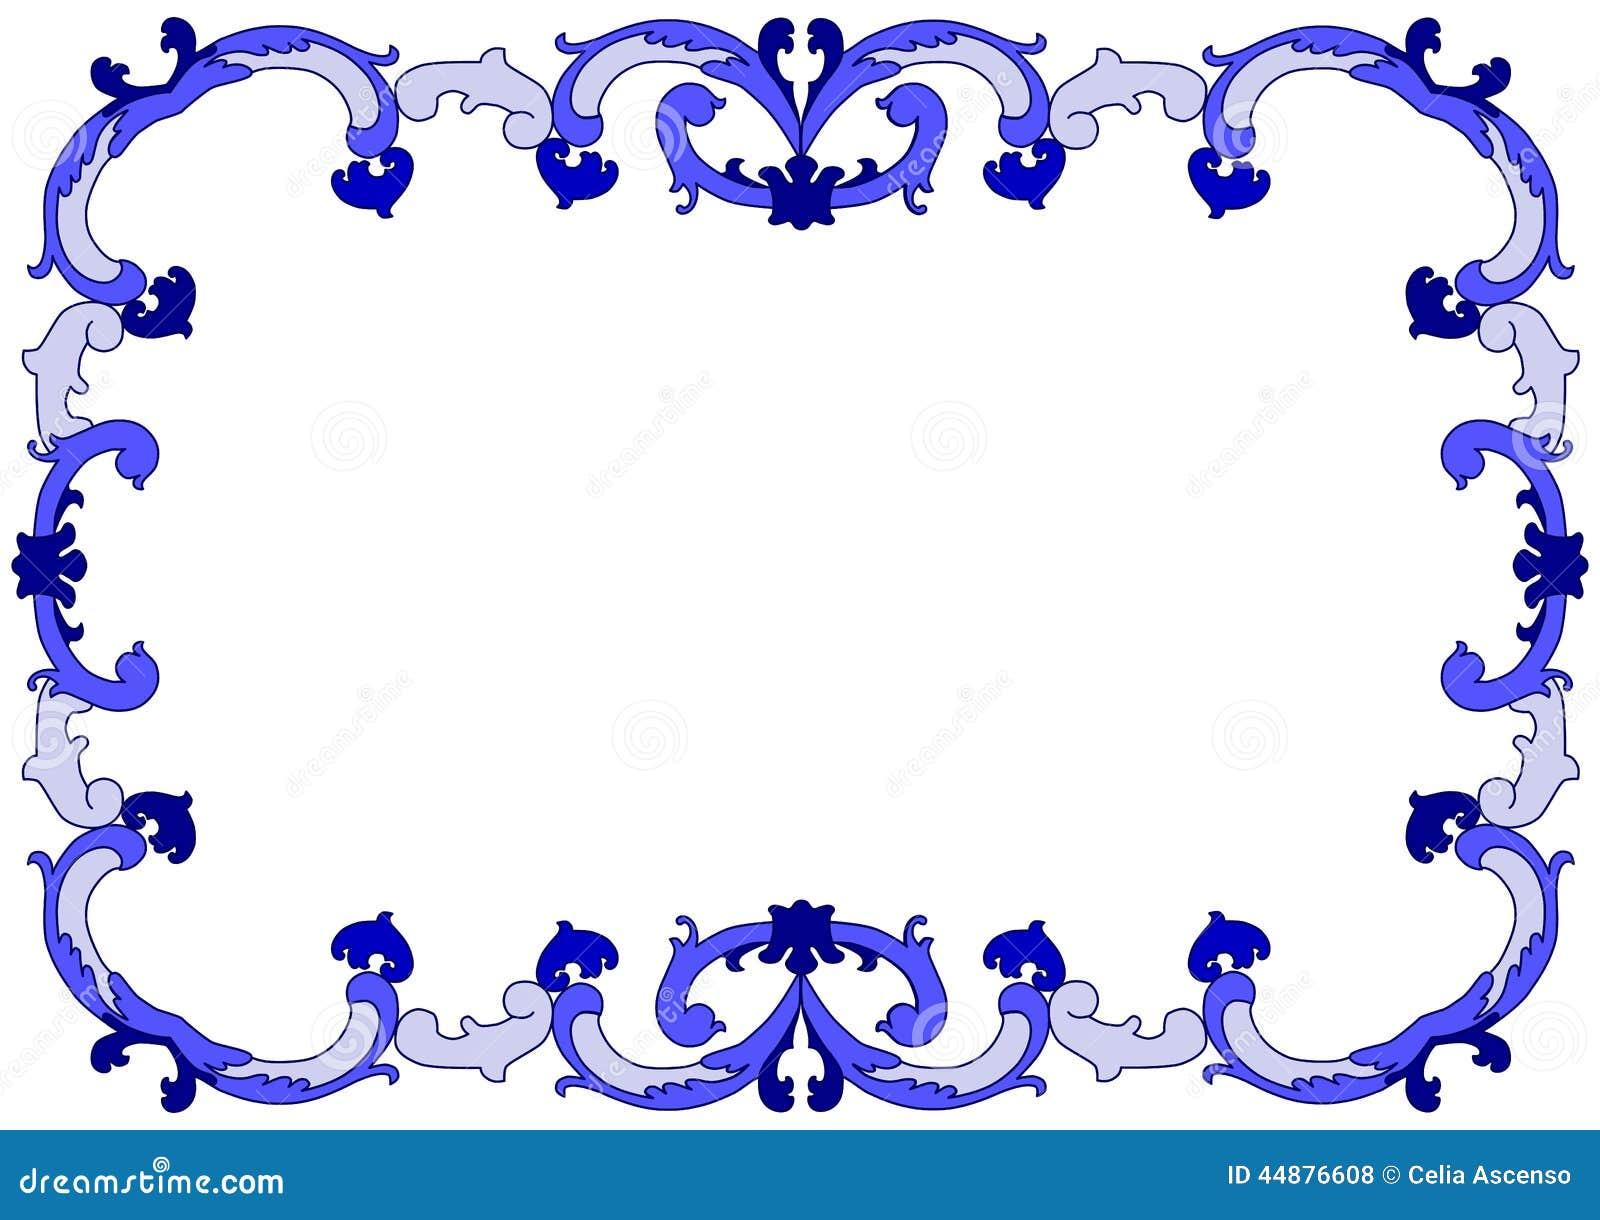 baroque waves frame border stock illustration image chiefs arrowhead clipart indian arrowhead clipart free